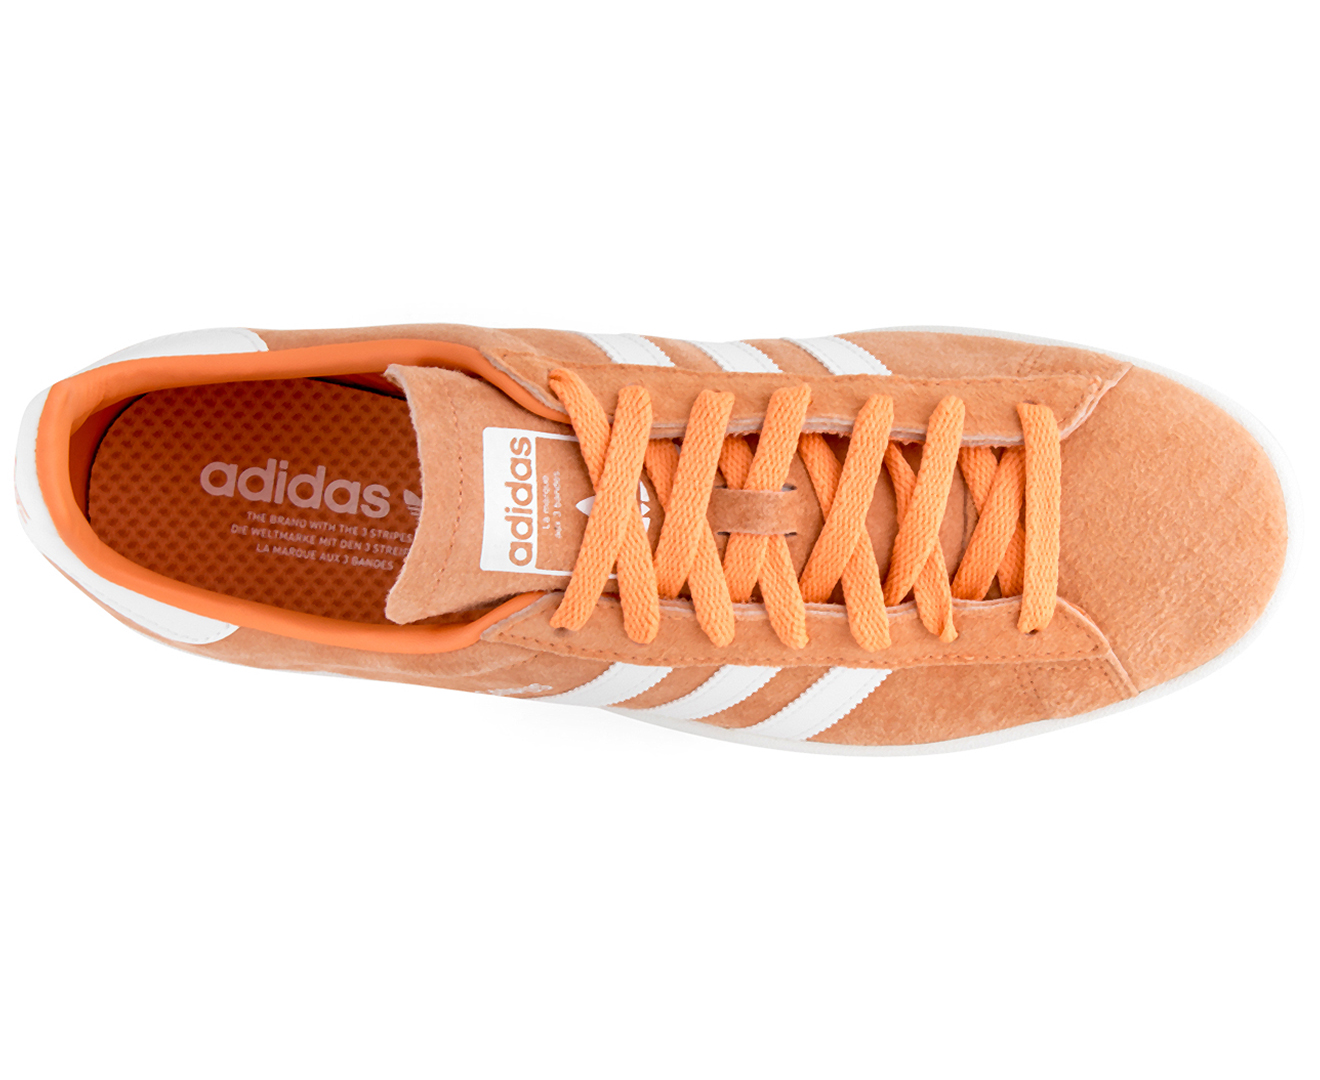 beadb8229dbf Adidas Originals Men s Campus Shoes - Easora White